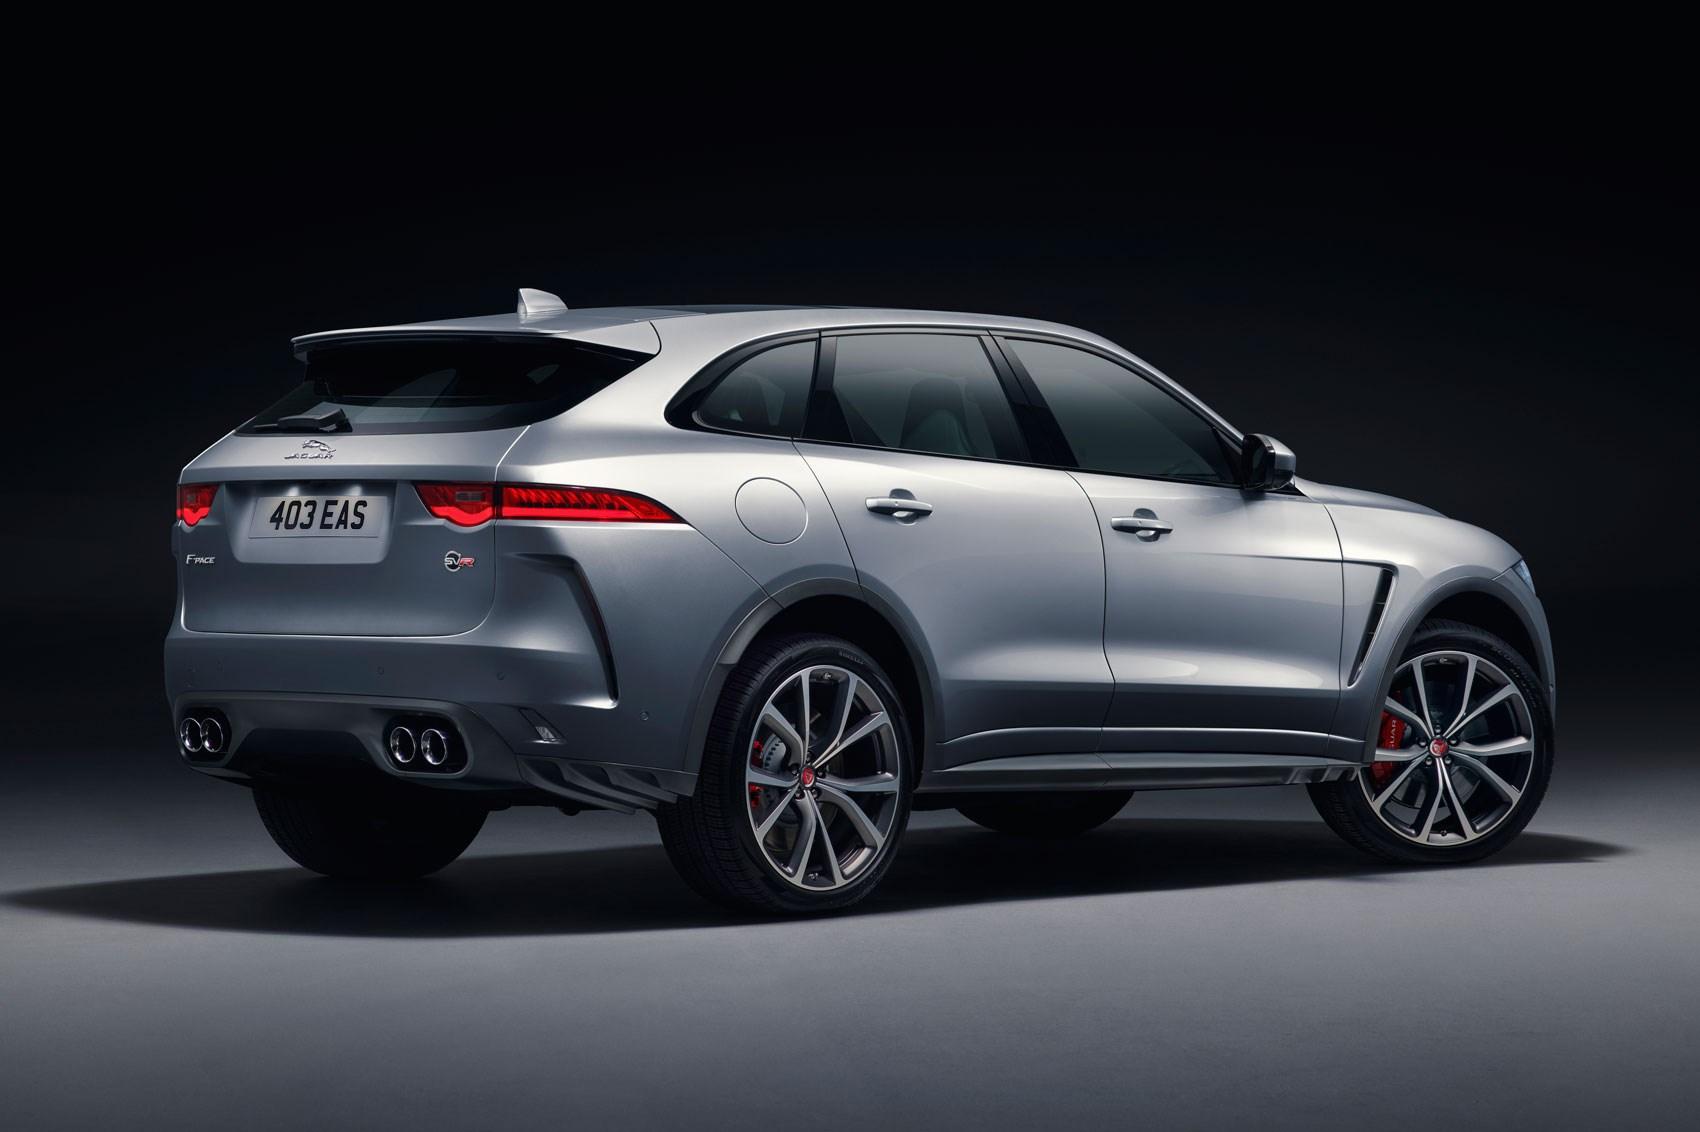 The New Jaguar F Pace Svr At York Auto Show